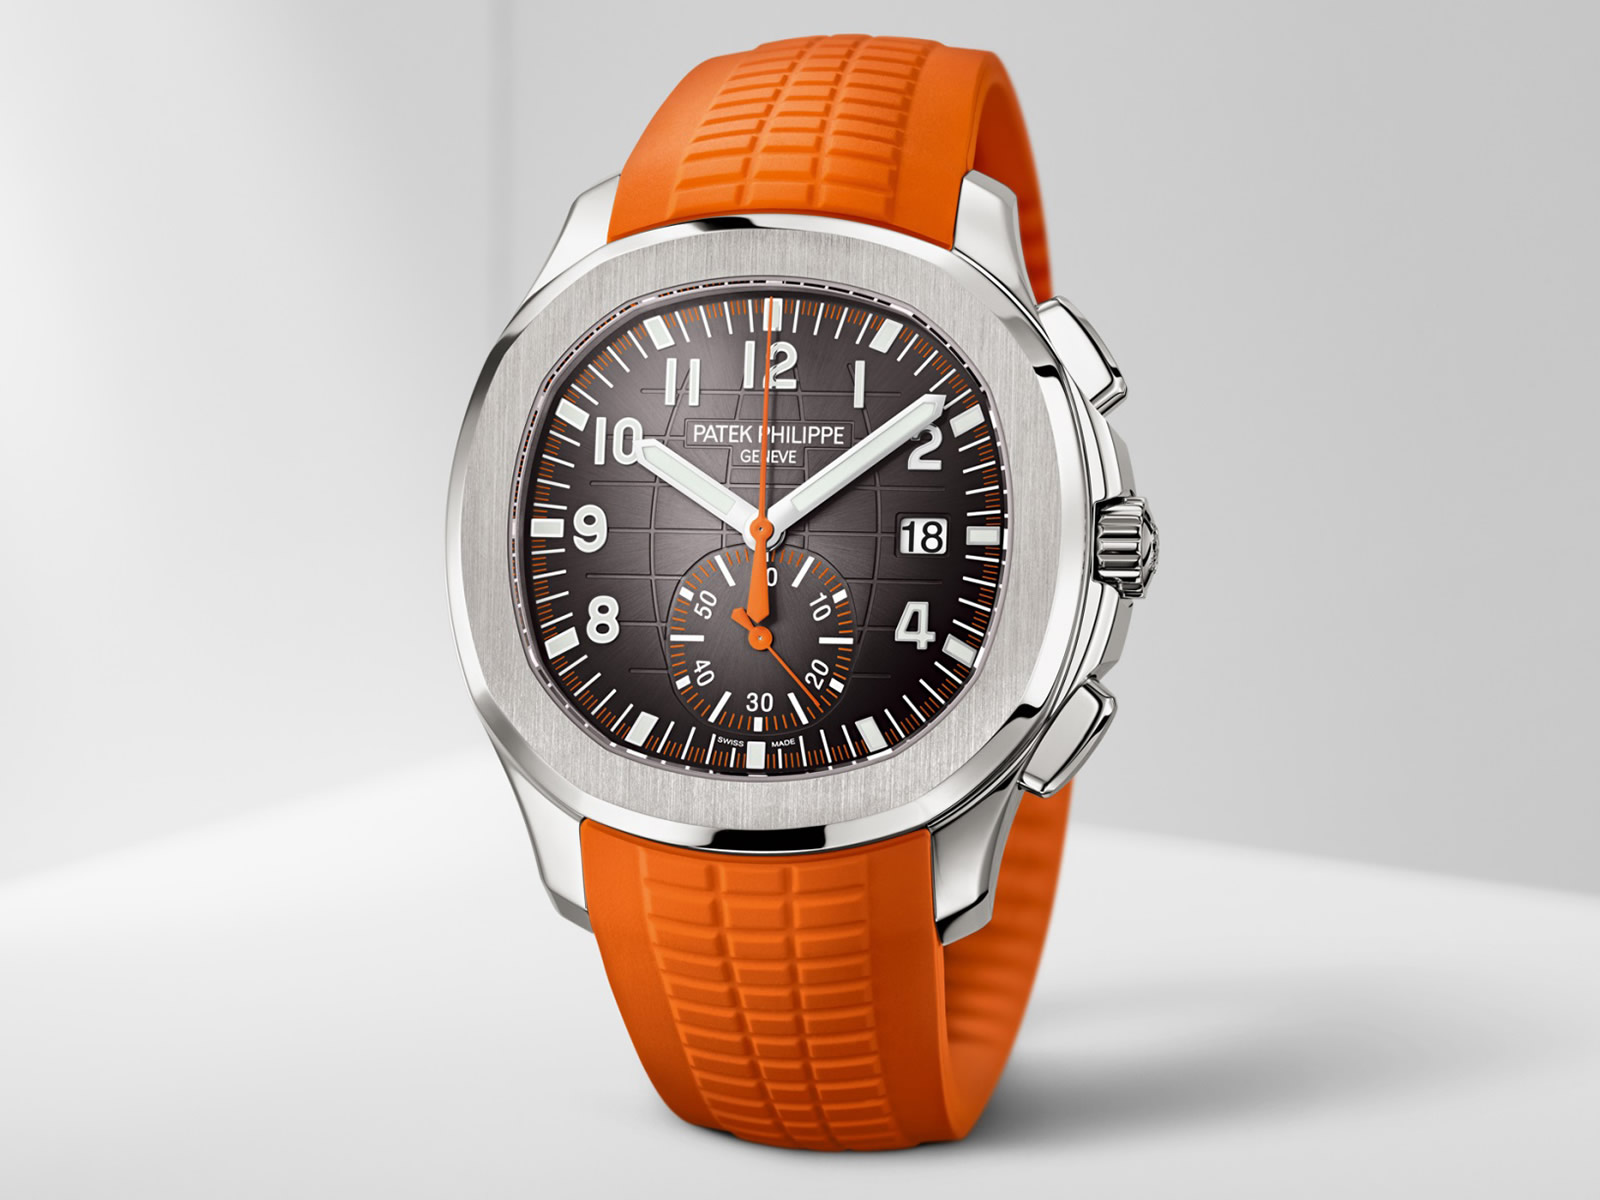 5968a-patek-philippe-aquanaut-chronograph-3-.jpg